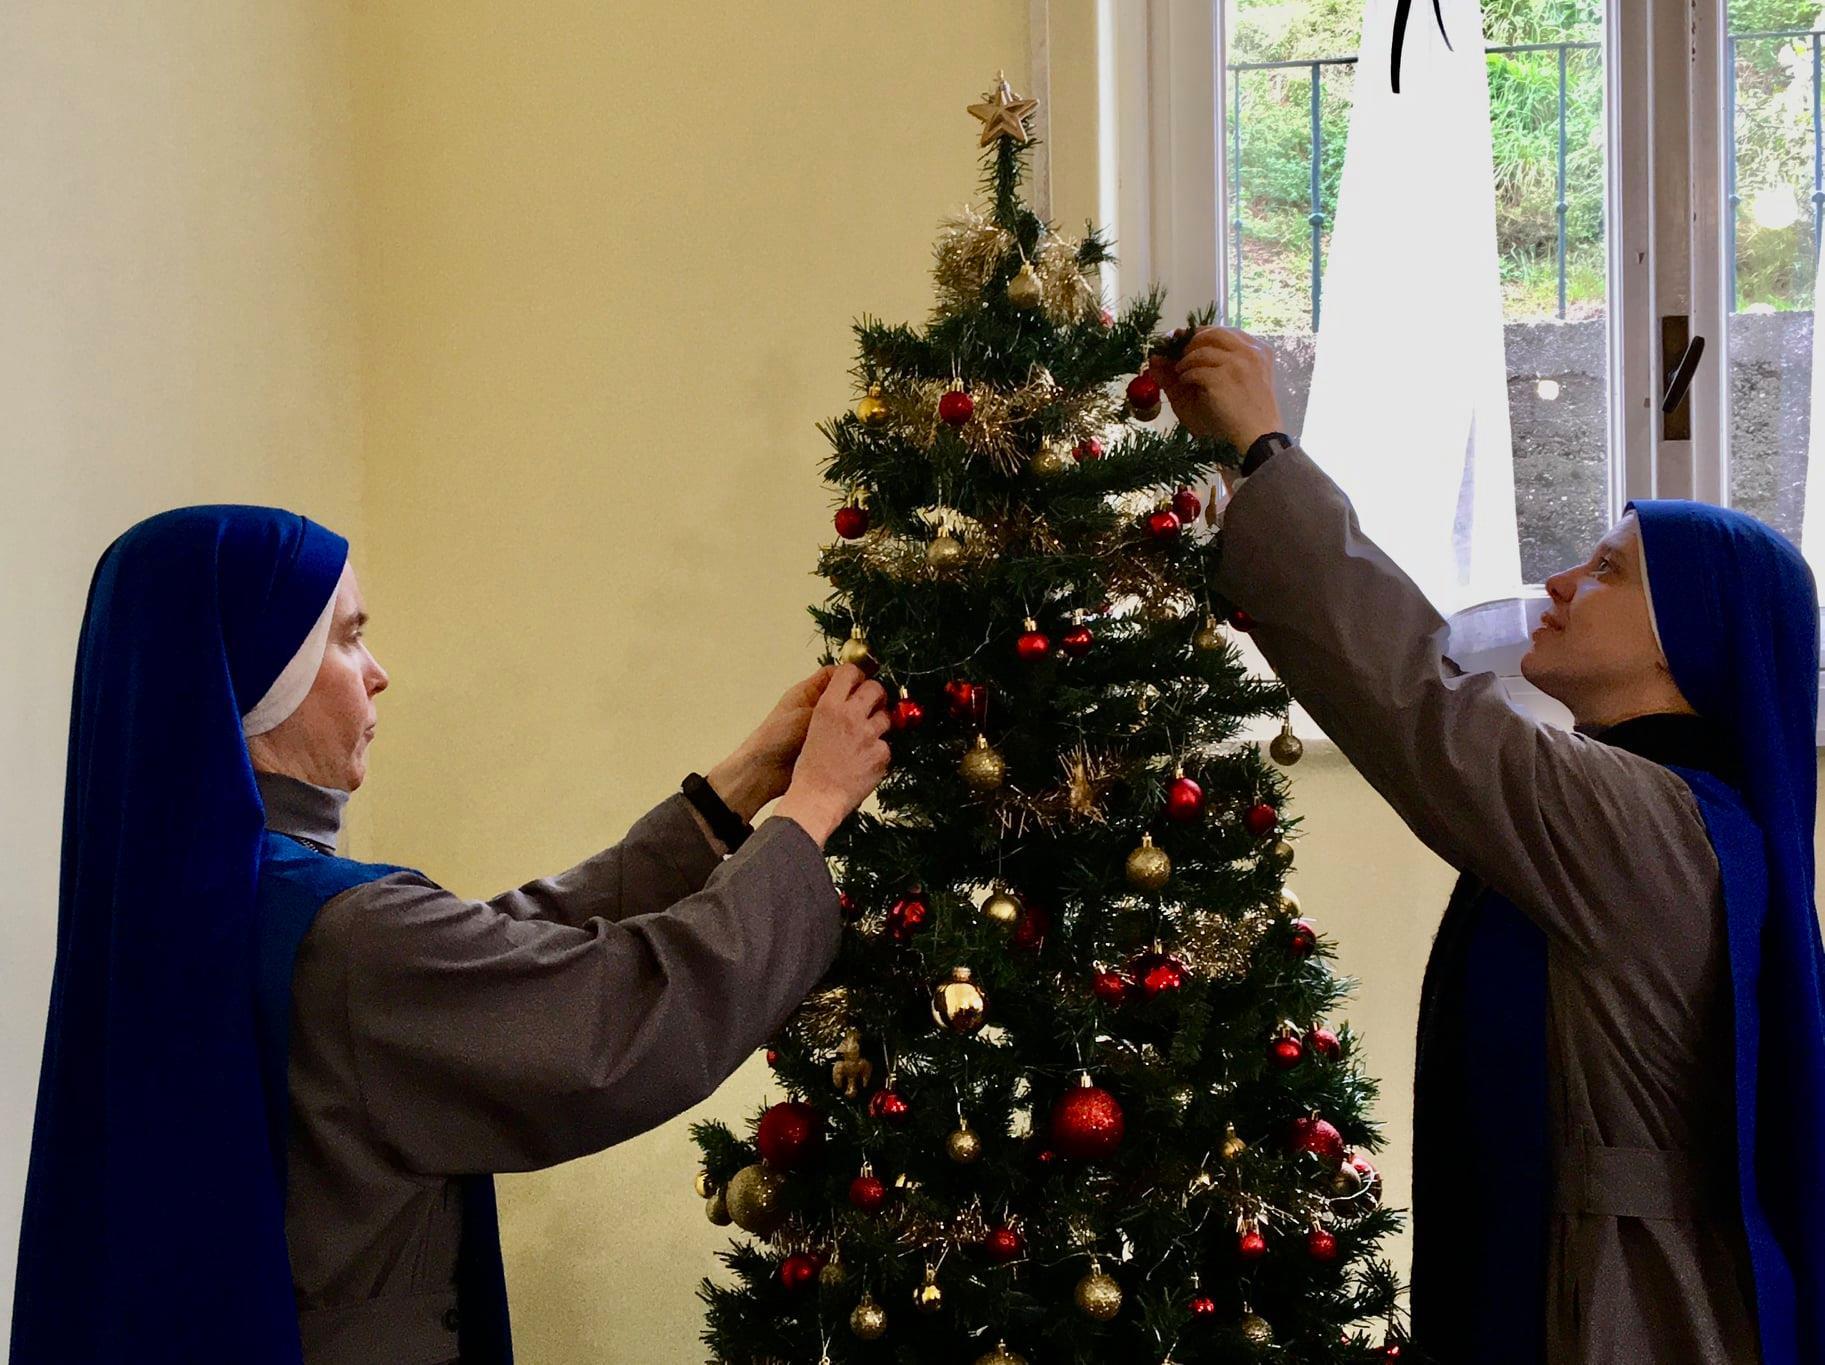 Italia - Preparando la Navidad en el Monasterio de Genova